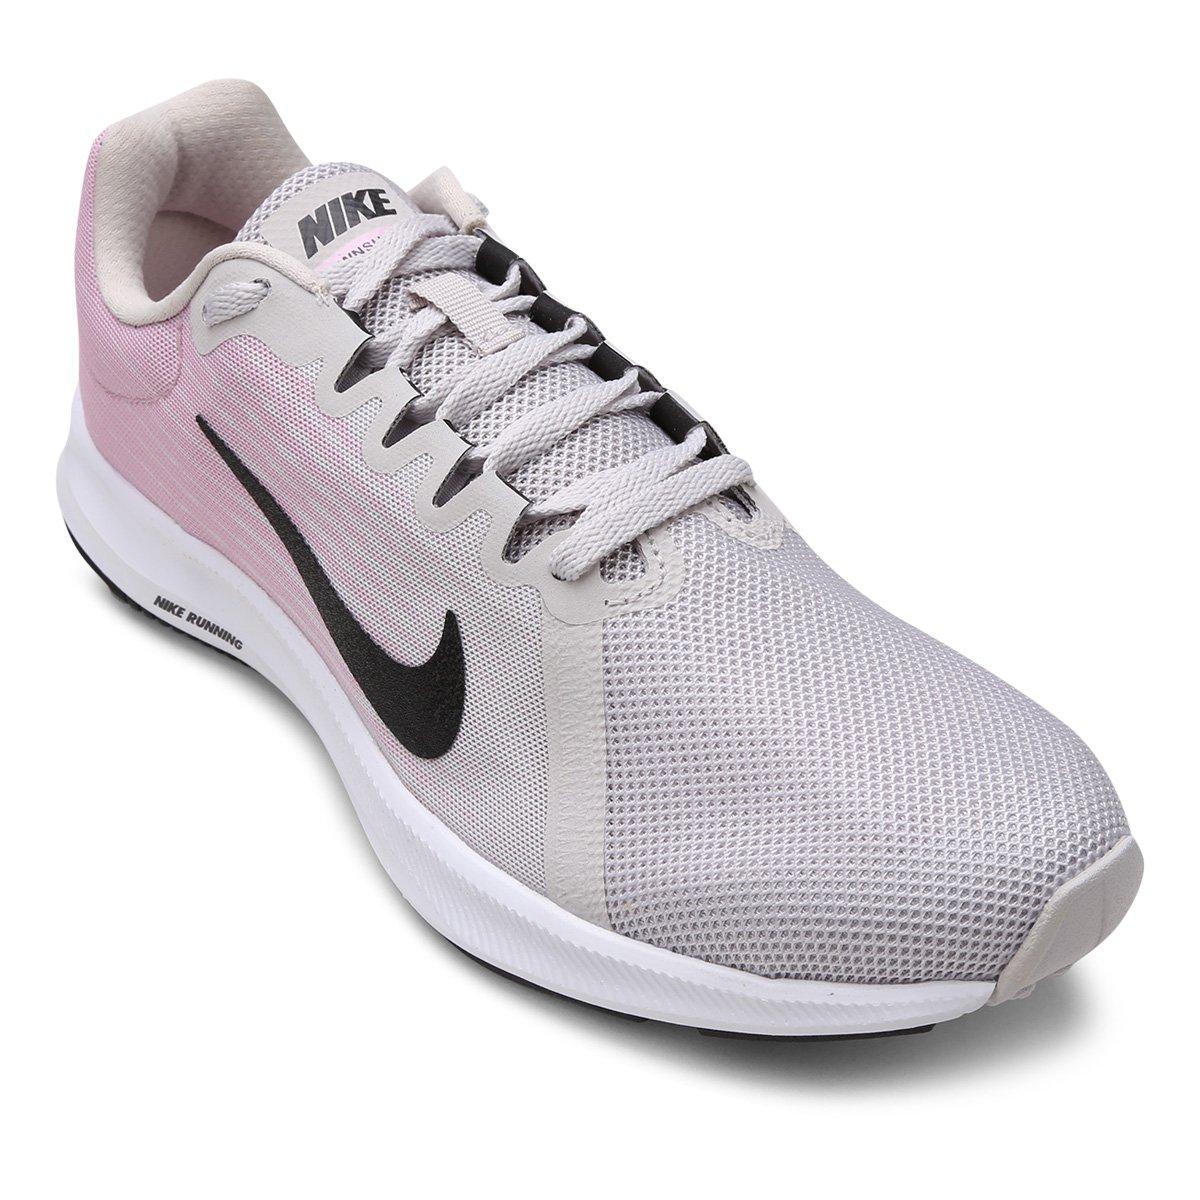 d78e9a9a4d Tênis Nike Wmns Downshifter 8 Feminino - Cinza - Compre Agora